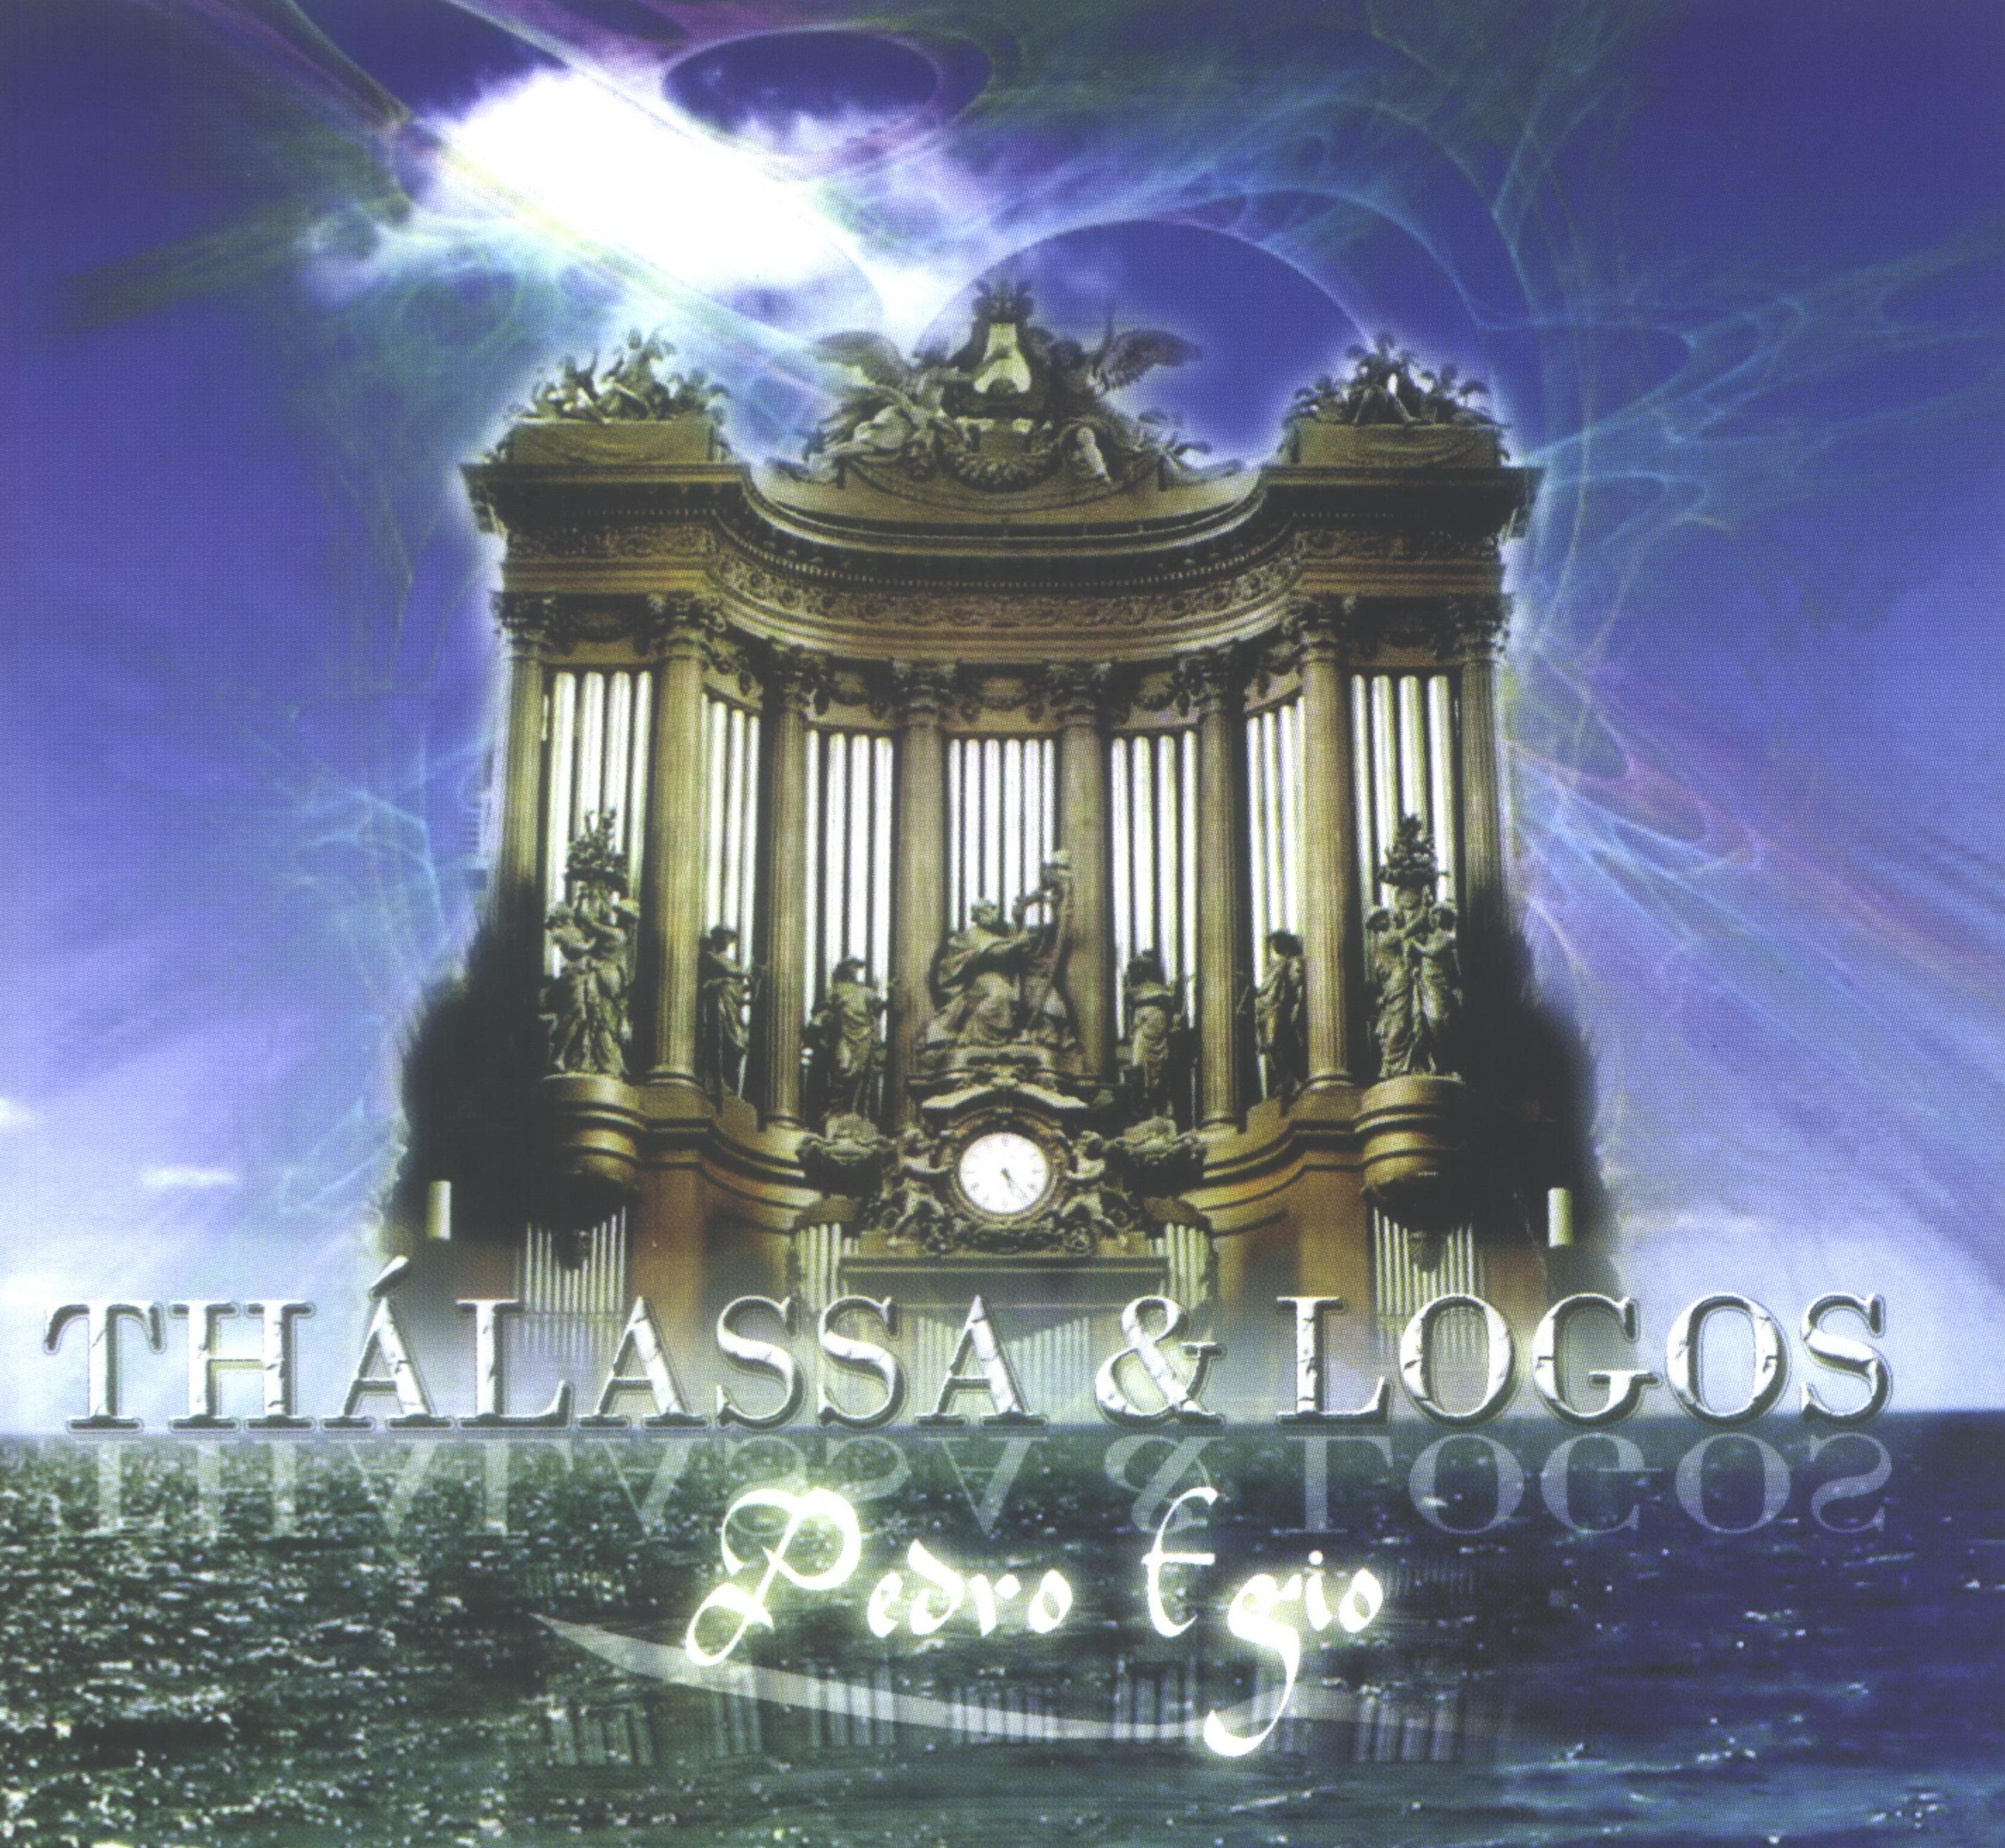 Thálassa & Logos